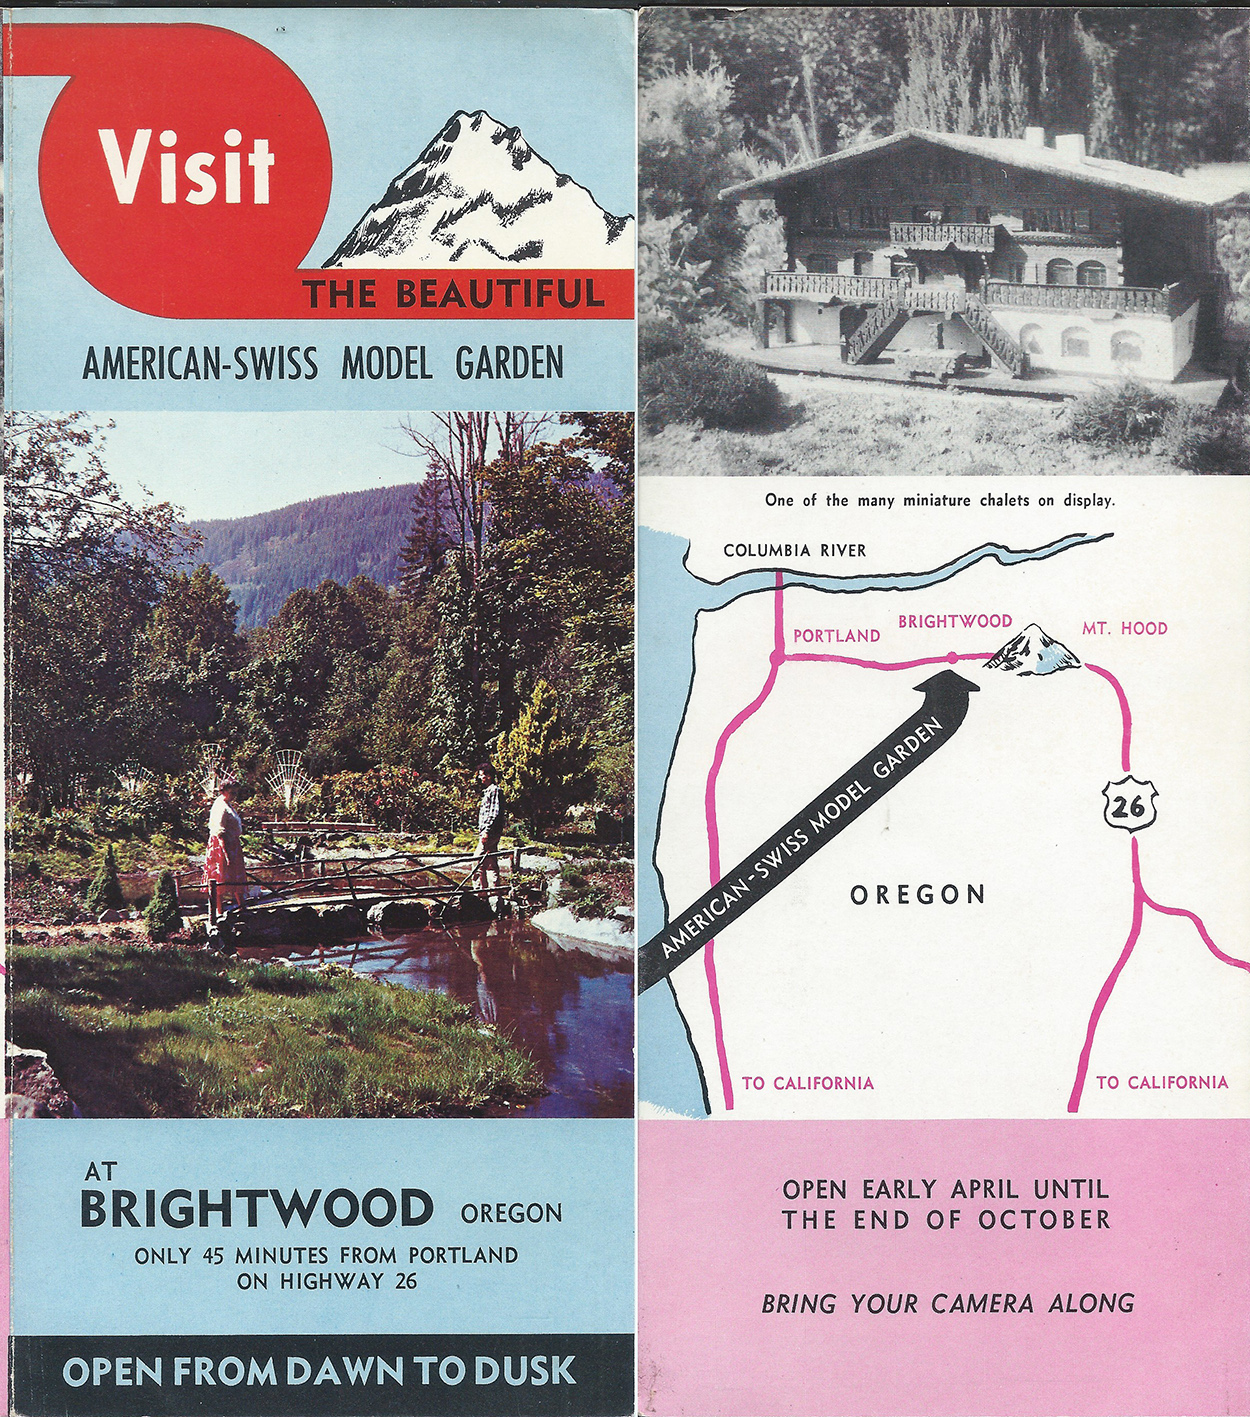 American - Swiss Model Garden Brightwood, Oregon